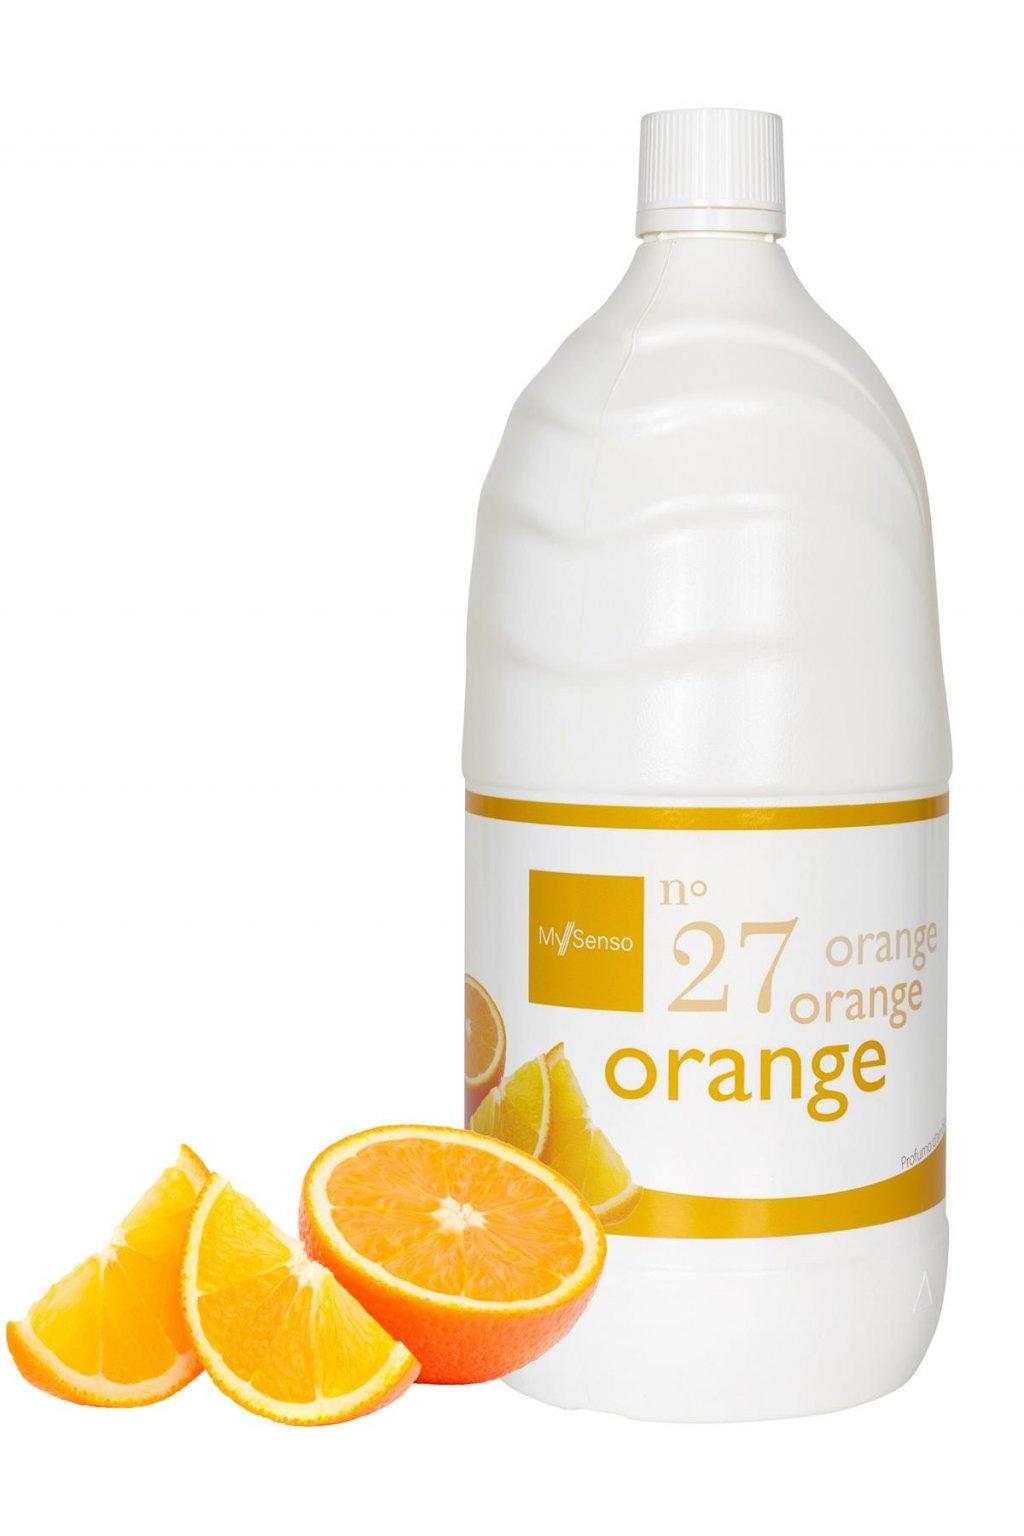 210 my senso nahradni napln pro aromaticky difuzer n 27 orange pomeranc 2000ml